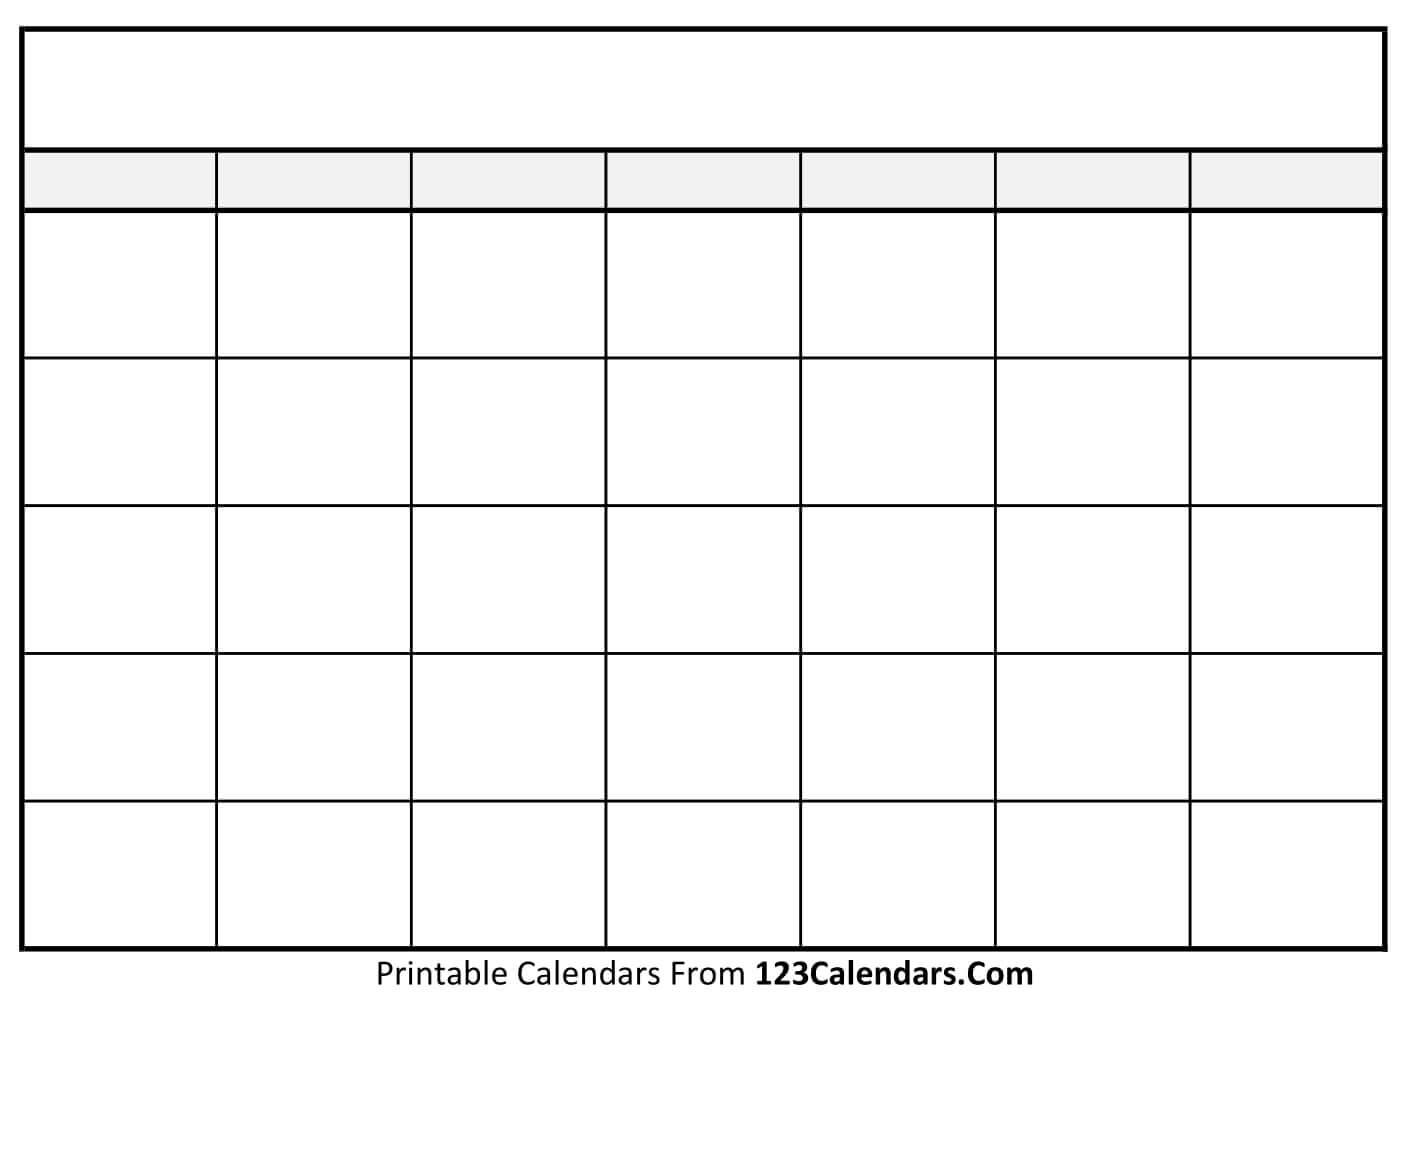 Free Printable Blank Calendar | 123Calendars with Empty Calendar Printable